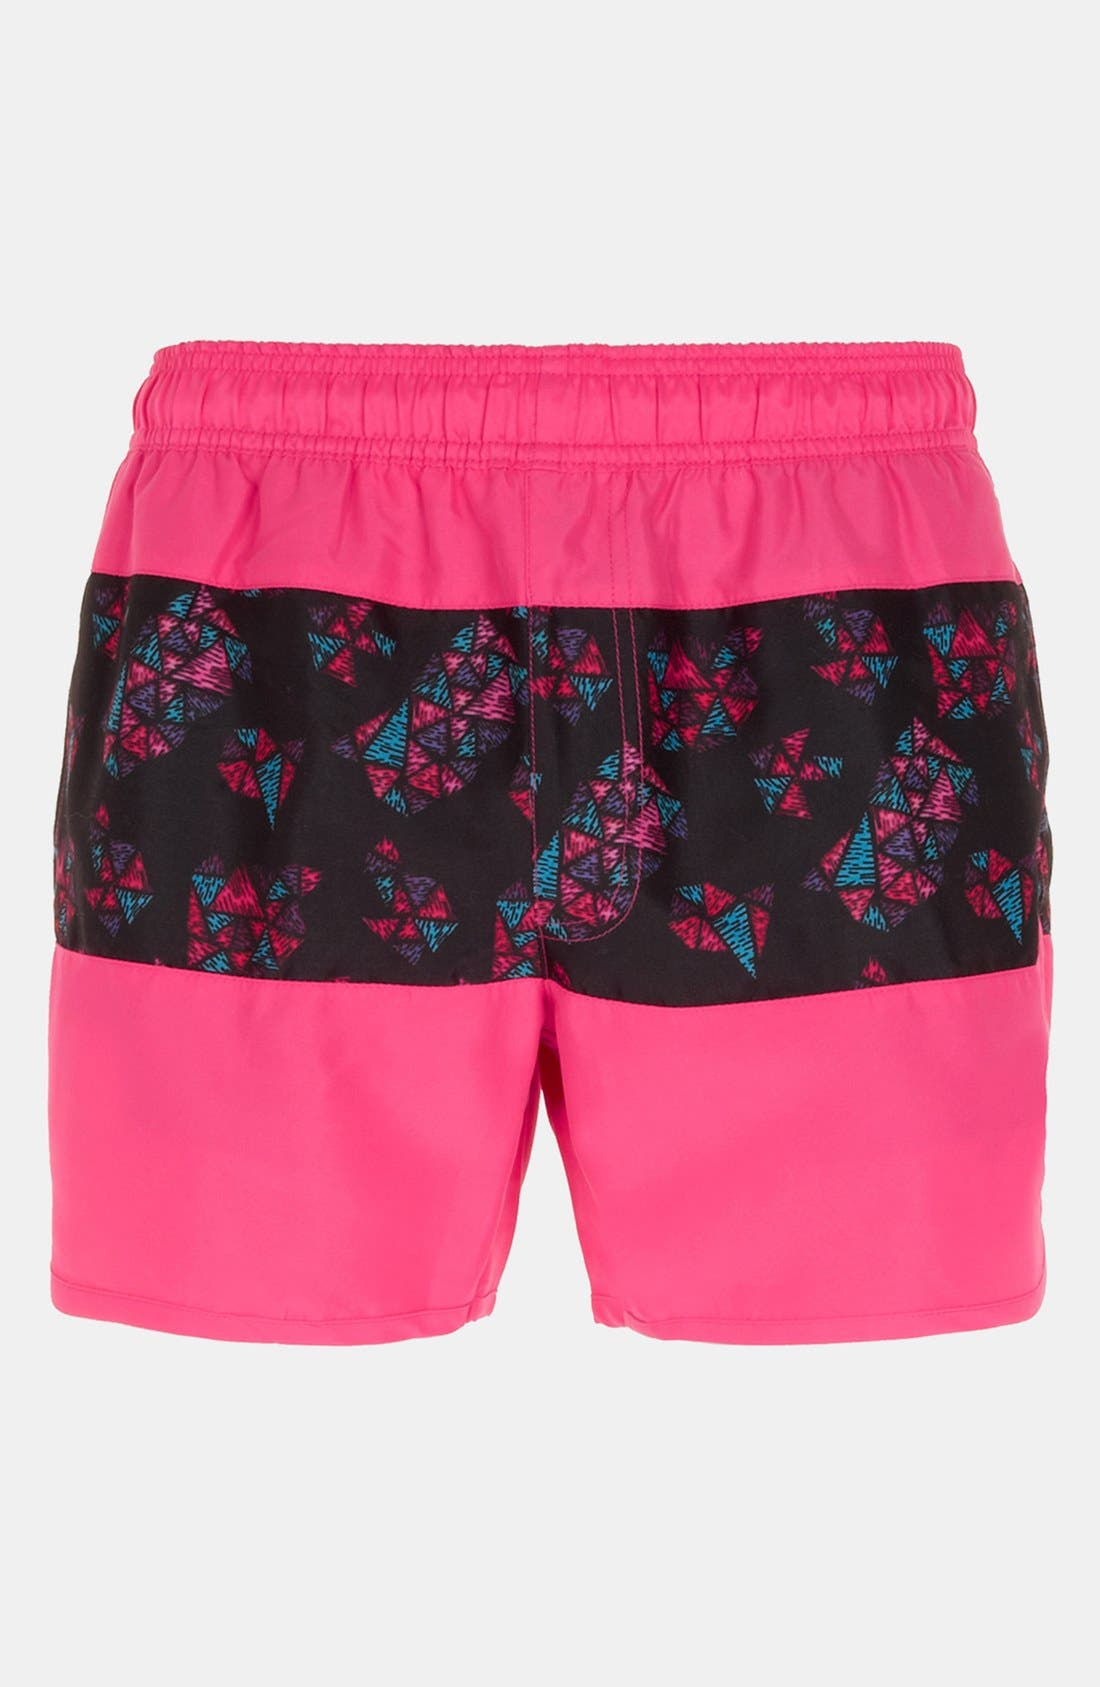 Alternate Image 1 Selected - Topman 'Rio' Swim Shorts